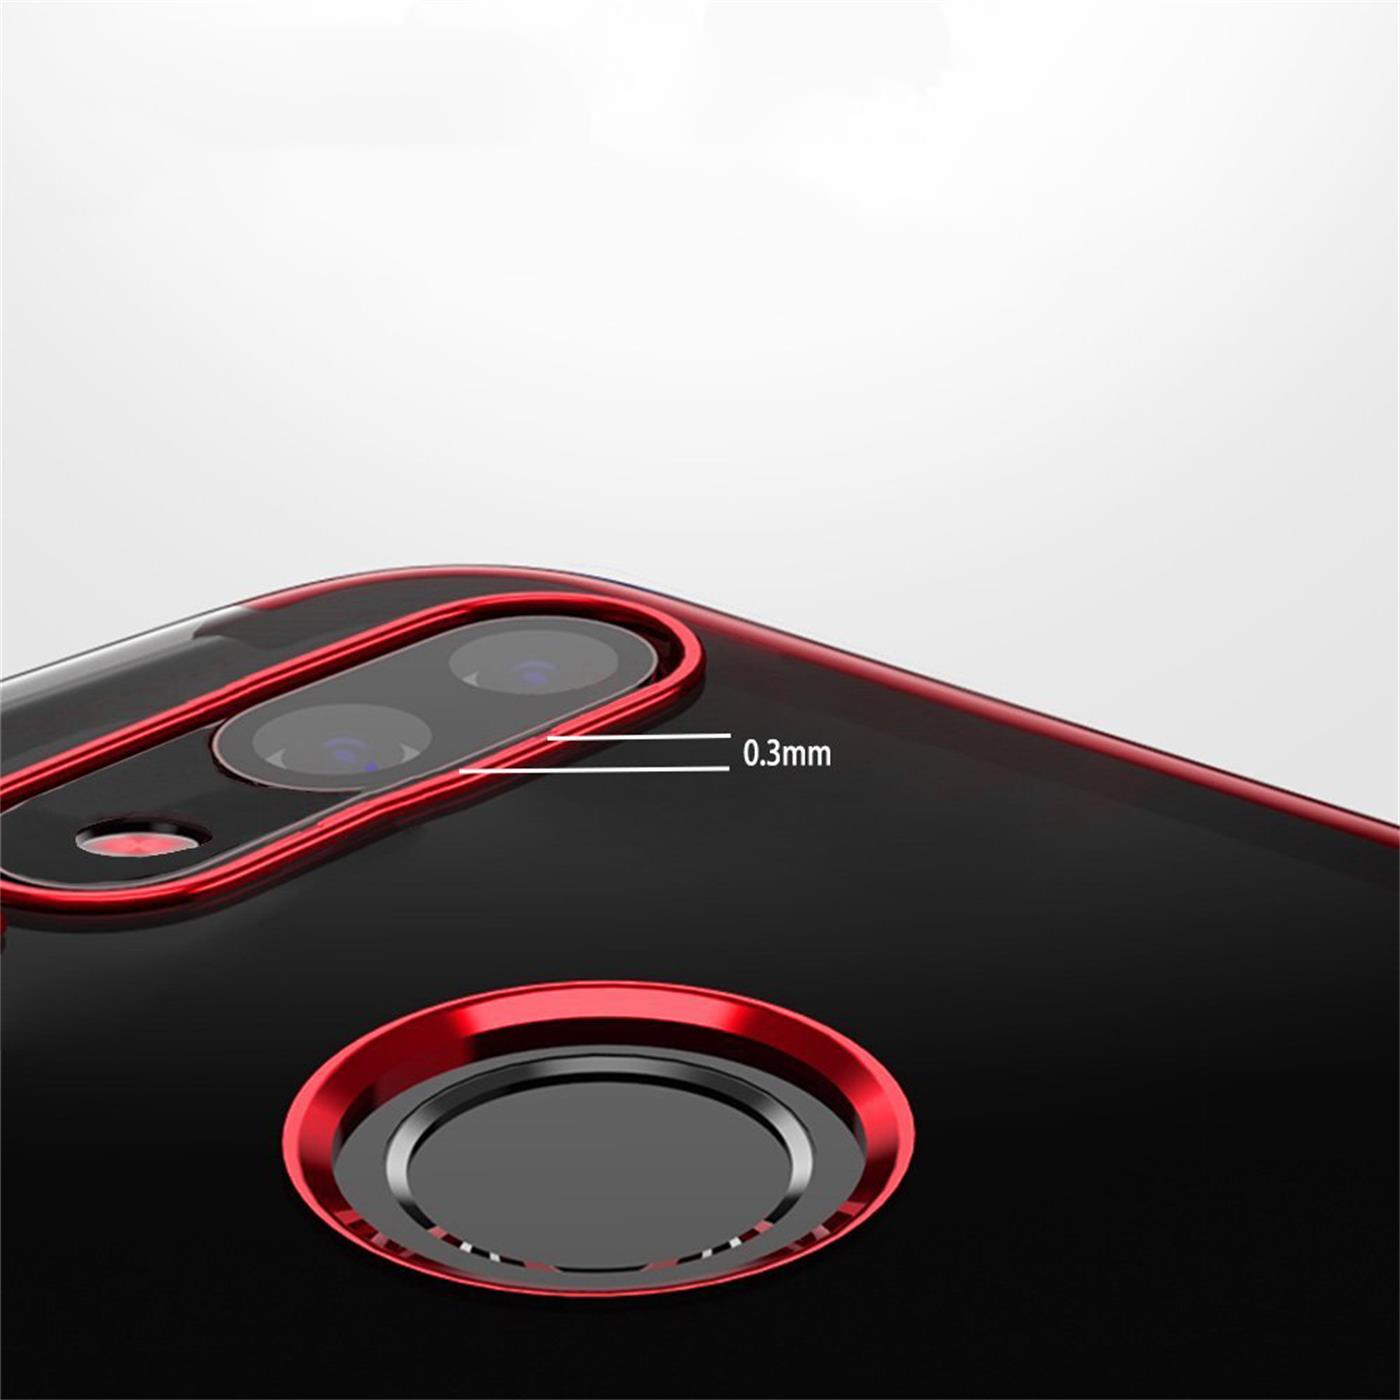 Silikon-Klar-Case-fuer-Huawei-p20-Lite-Ultra-Slim-Stossfeste-Gel-Rueckseite Indexbild 14